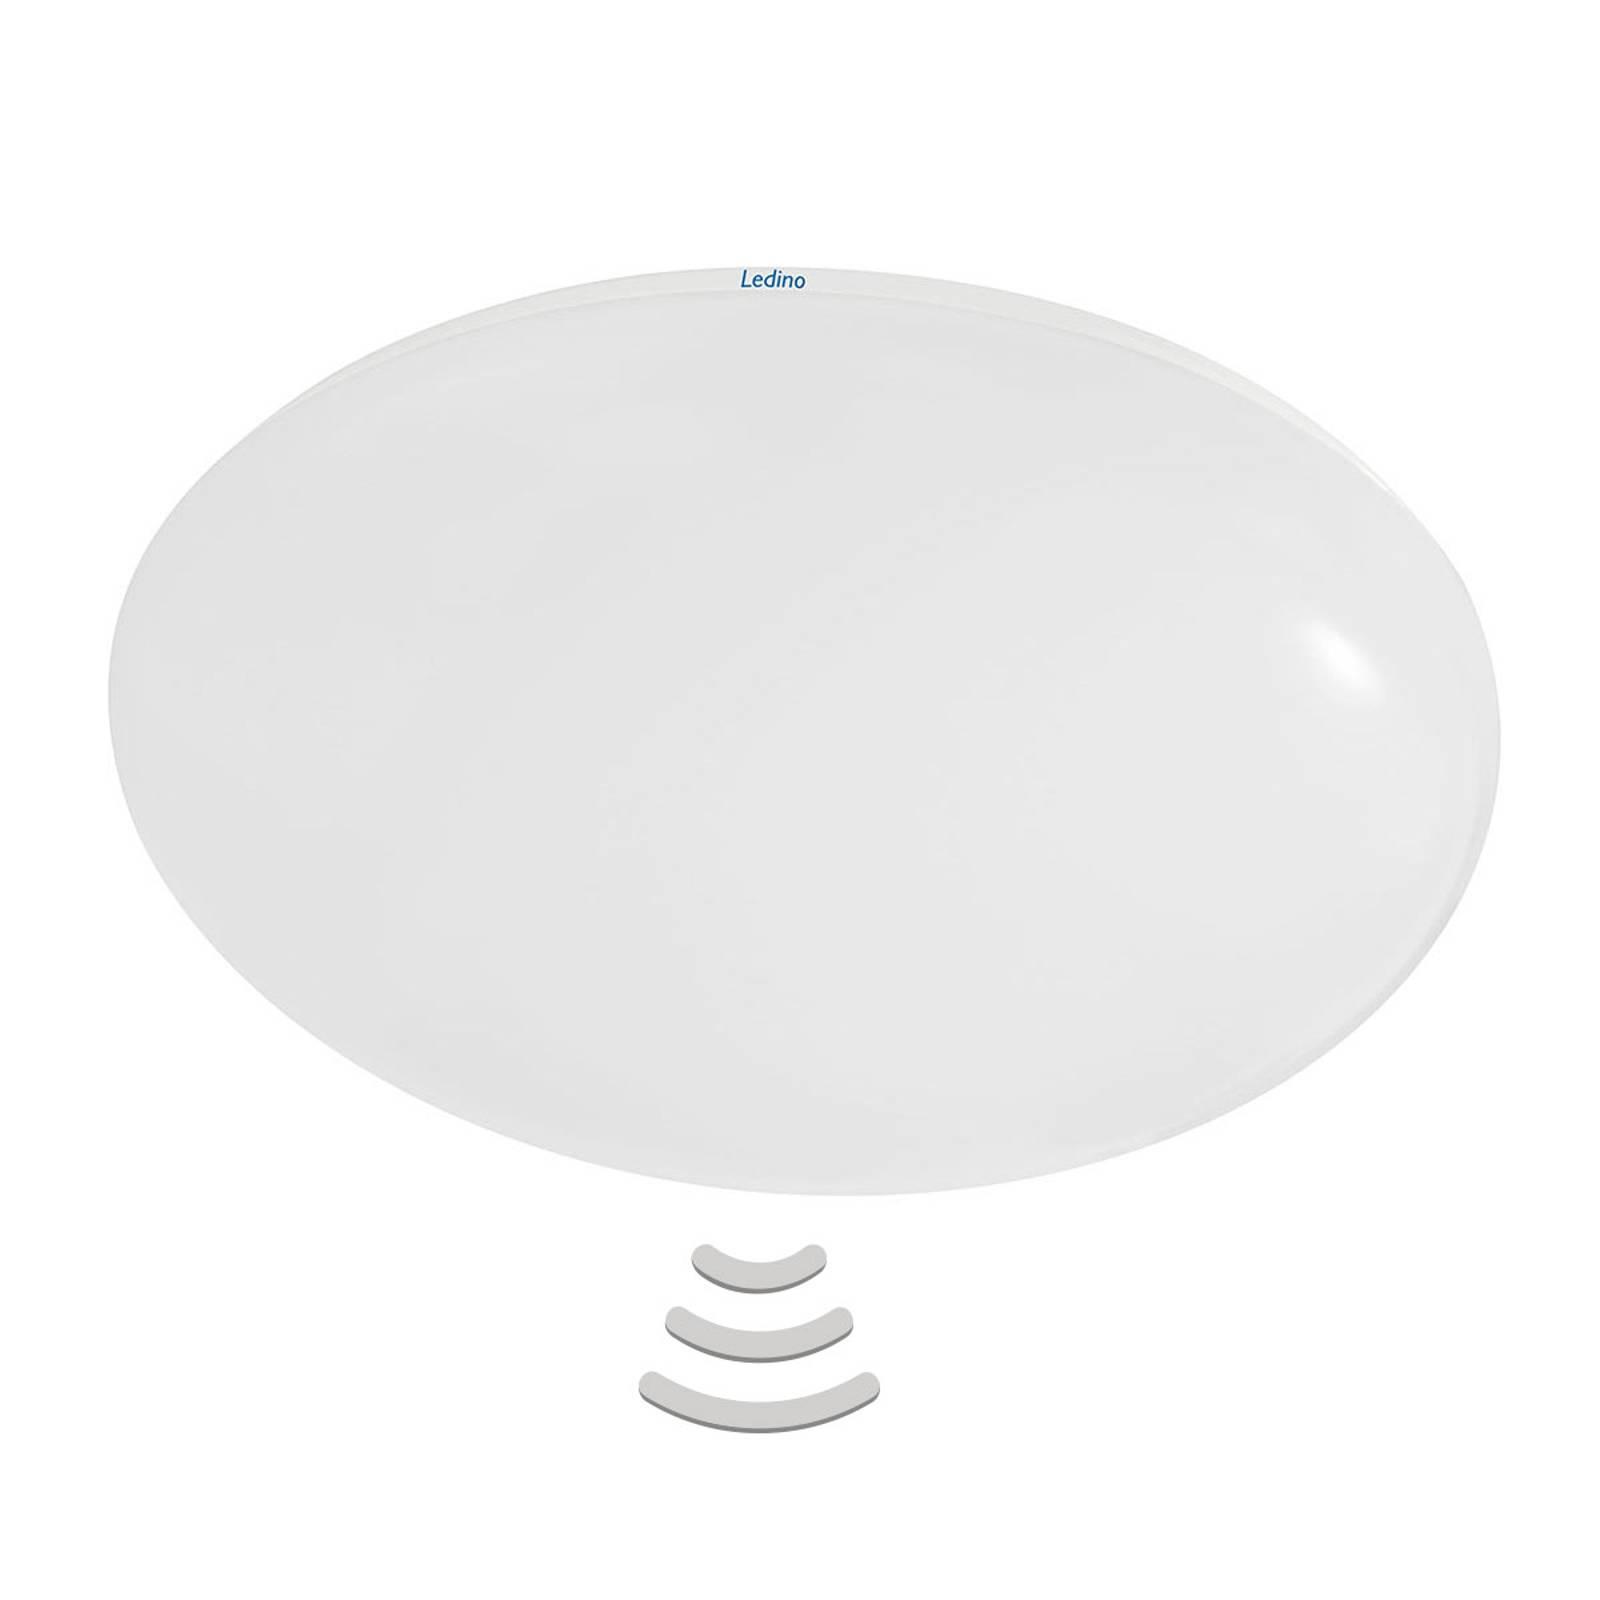 Lampa sufitowa LED Altona, czujnik HF 4000 K 32cm